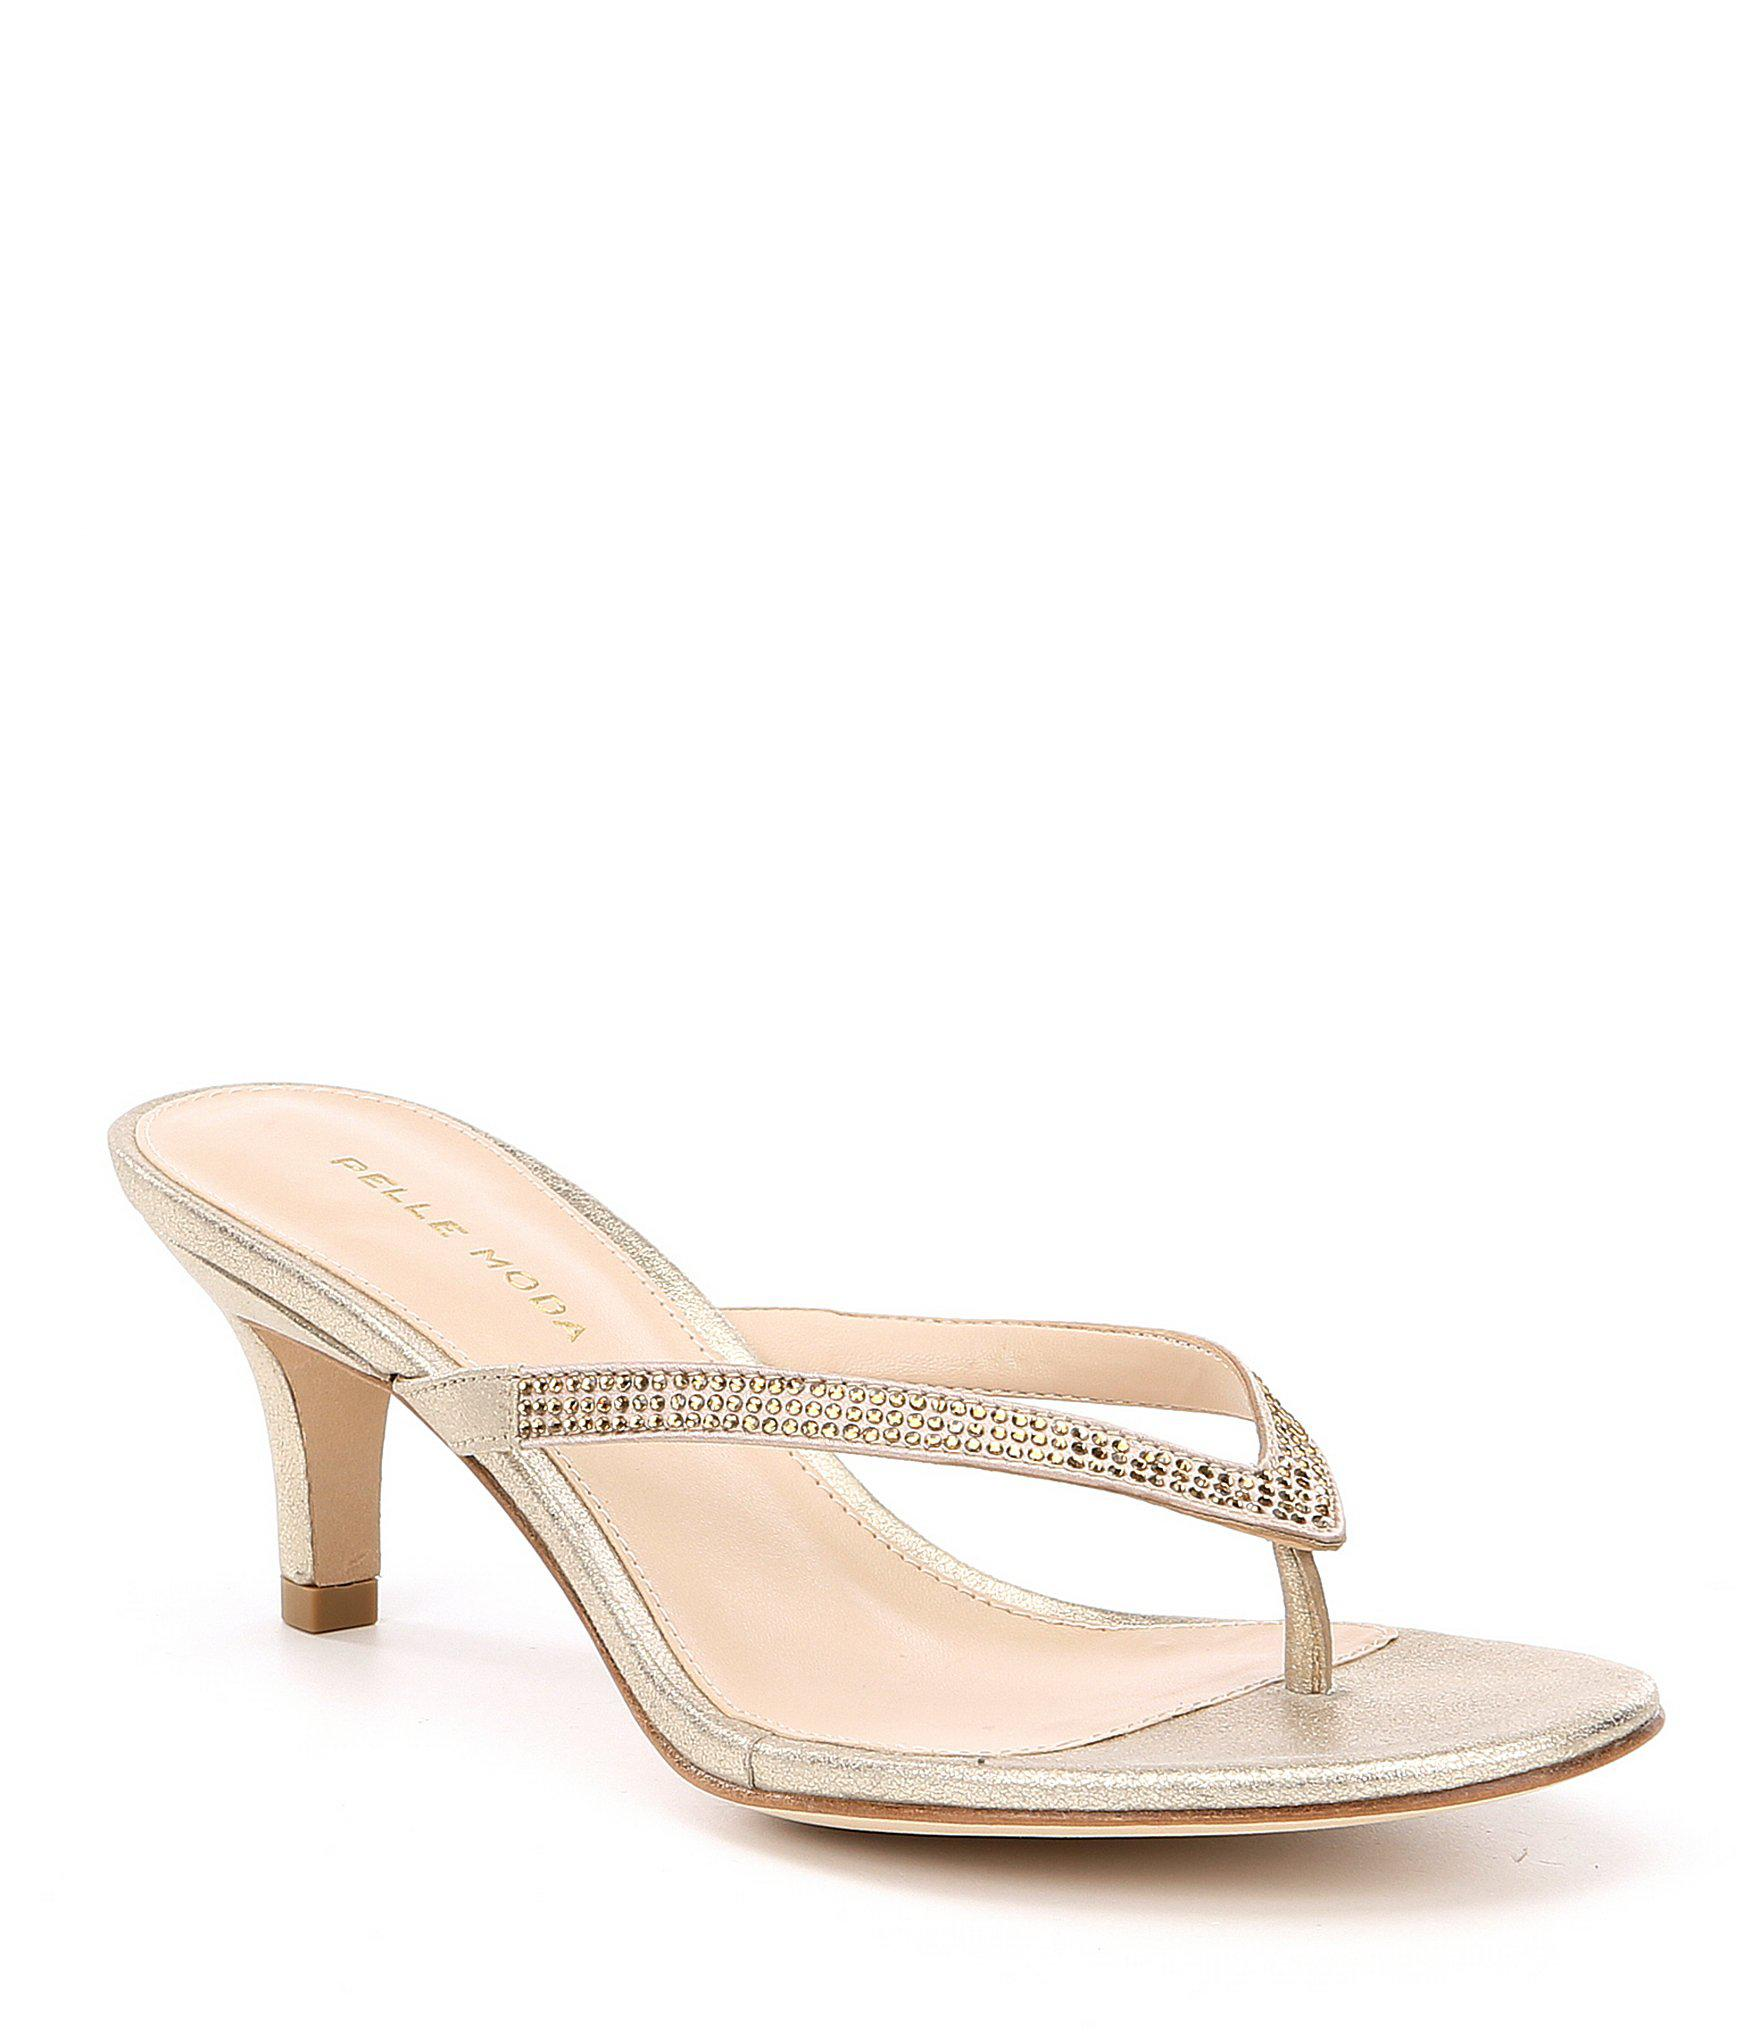 4063f51c254 Lyst - Pelle Moda Effi Satin And Leather Rhinestone Detail Dress Sandals